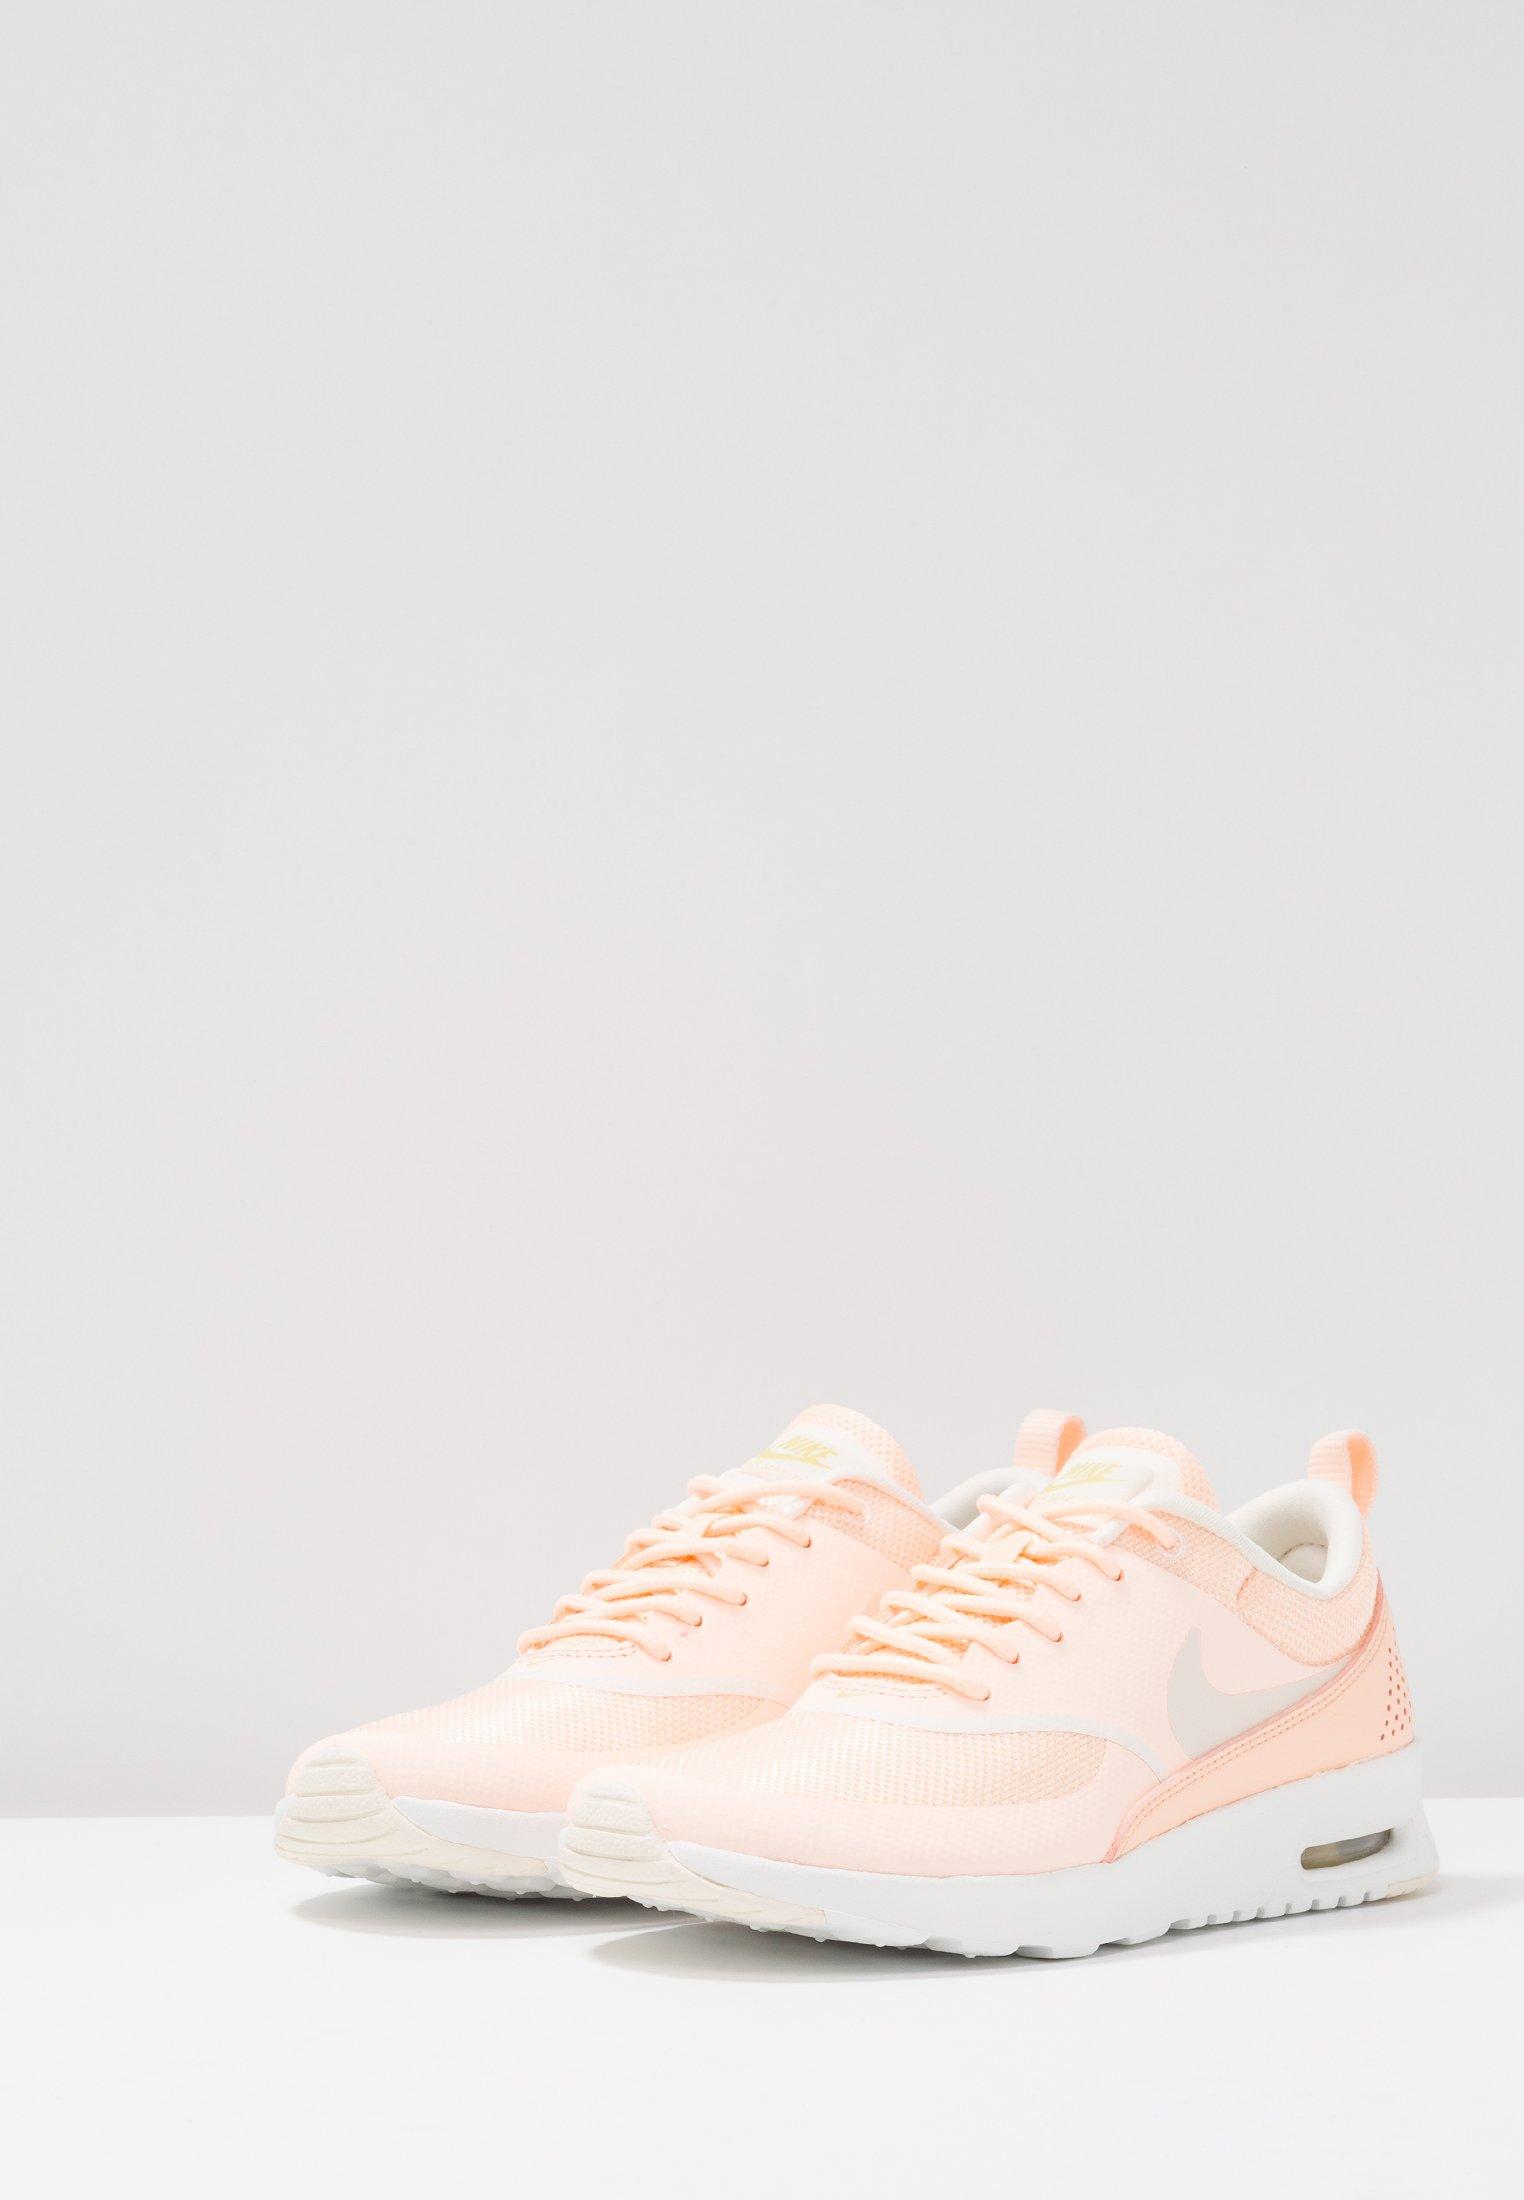 AIR MAX THEA Sneakers crimson tintpale ivorycelerysummit white